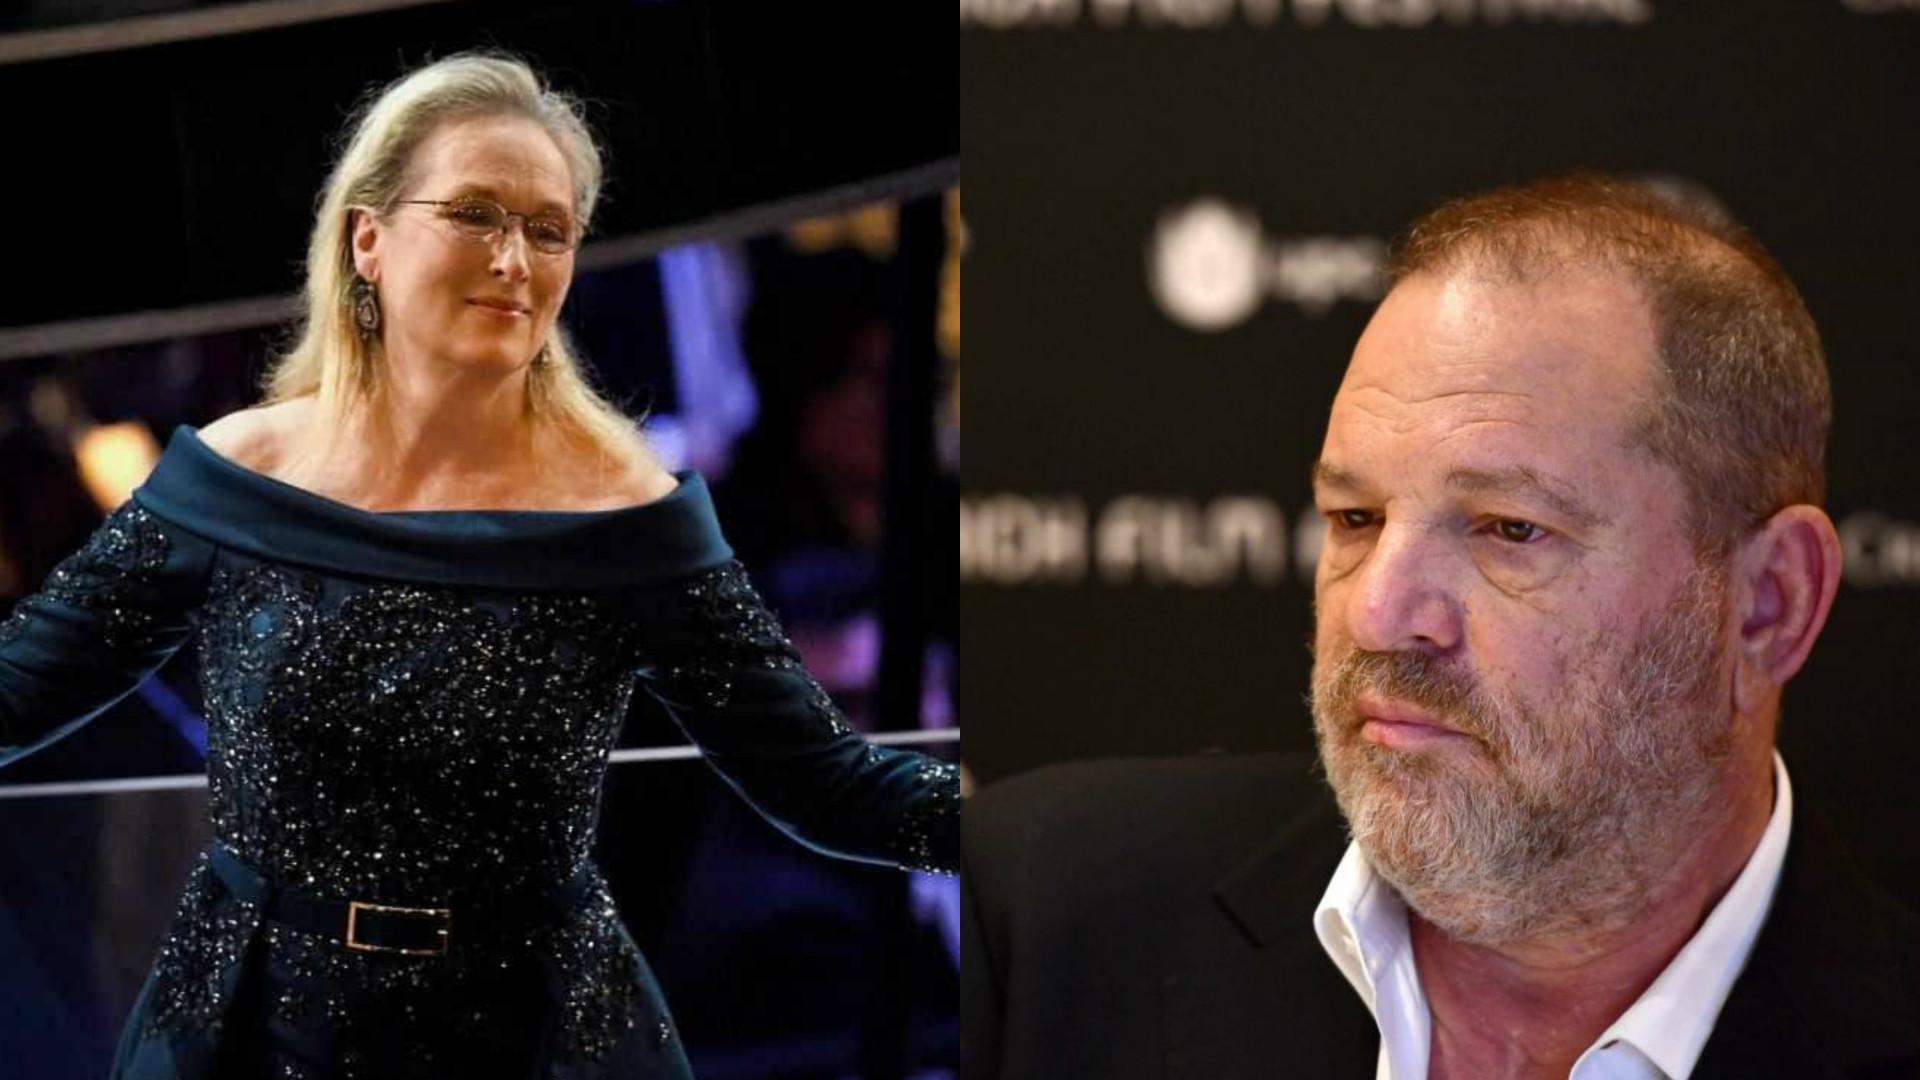 Lawrence arrasa defesa de Weinstein: